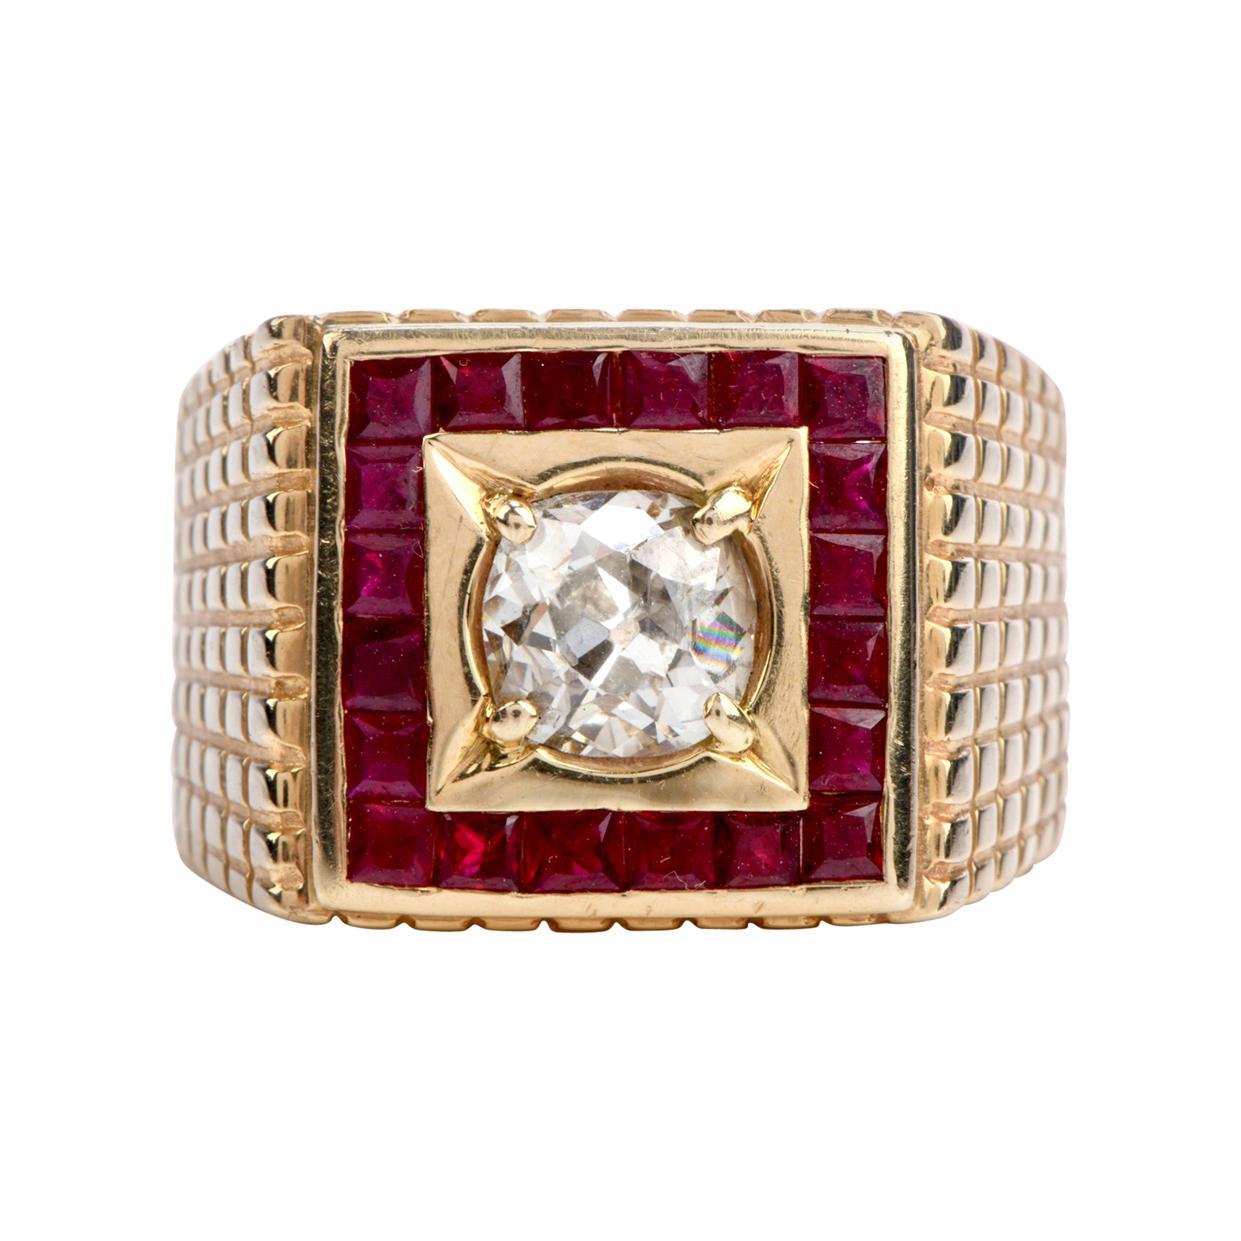 Old Cut Diamond Ruby 14 Karat Gold Retro Textured Men's Ring